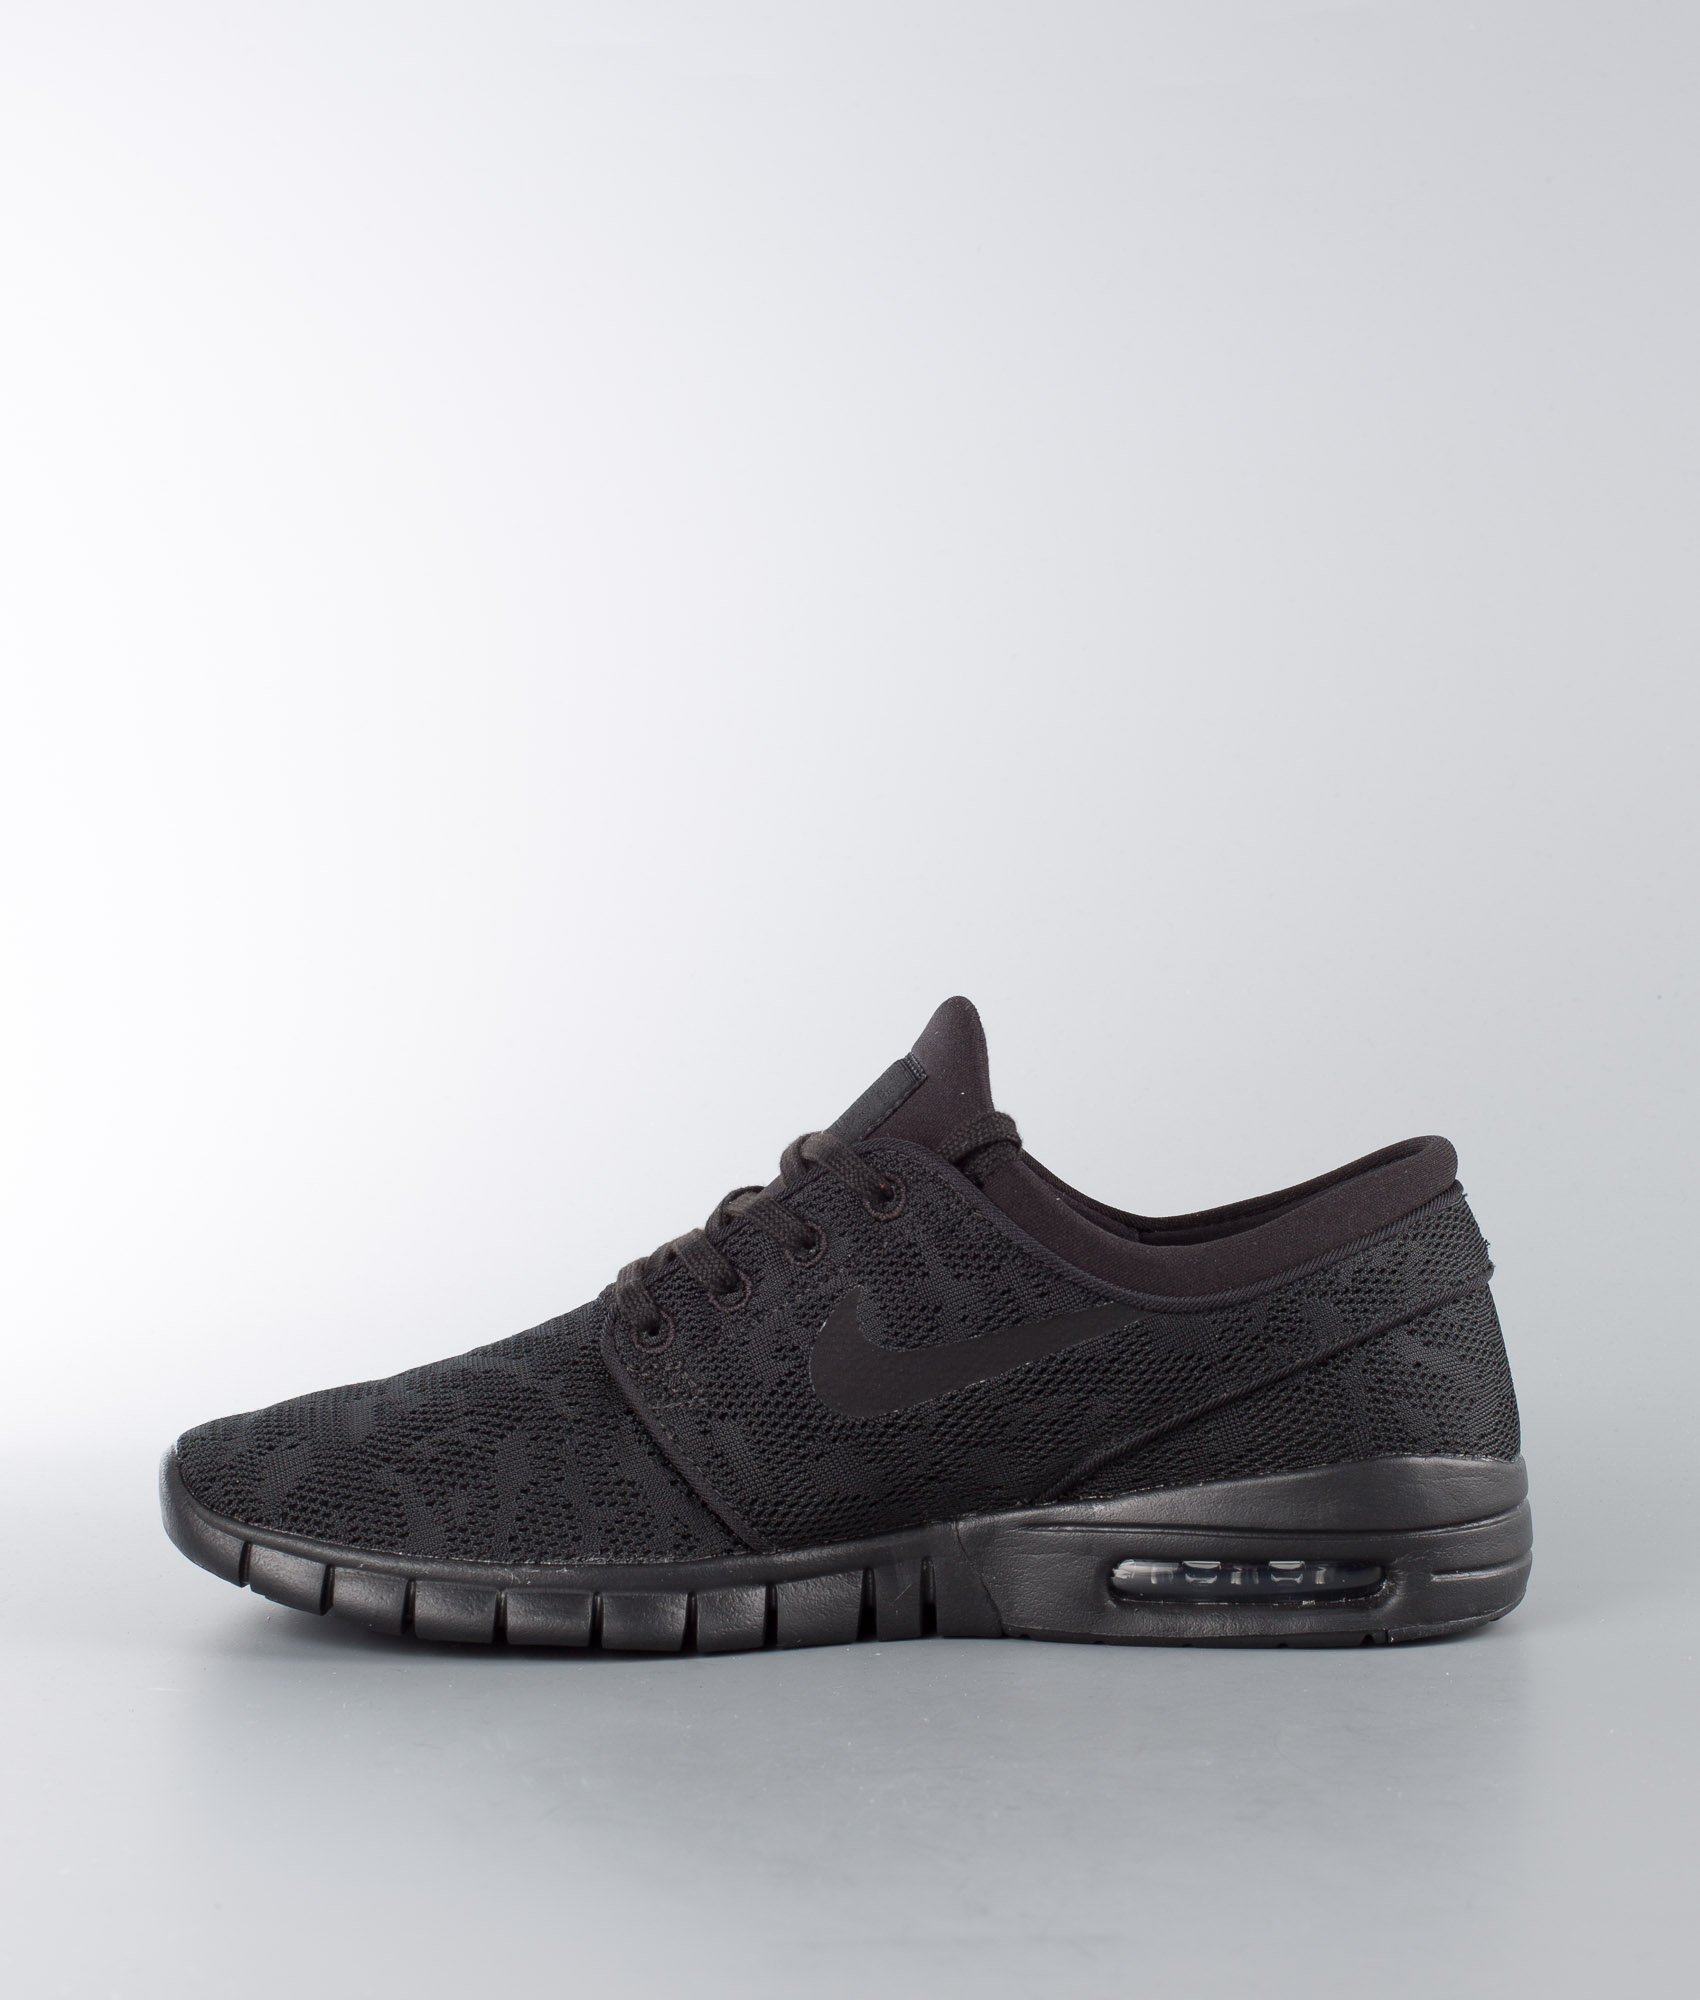 2336d27b25b discount code for nike stefan janoski max shoes 3b5ef dc313